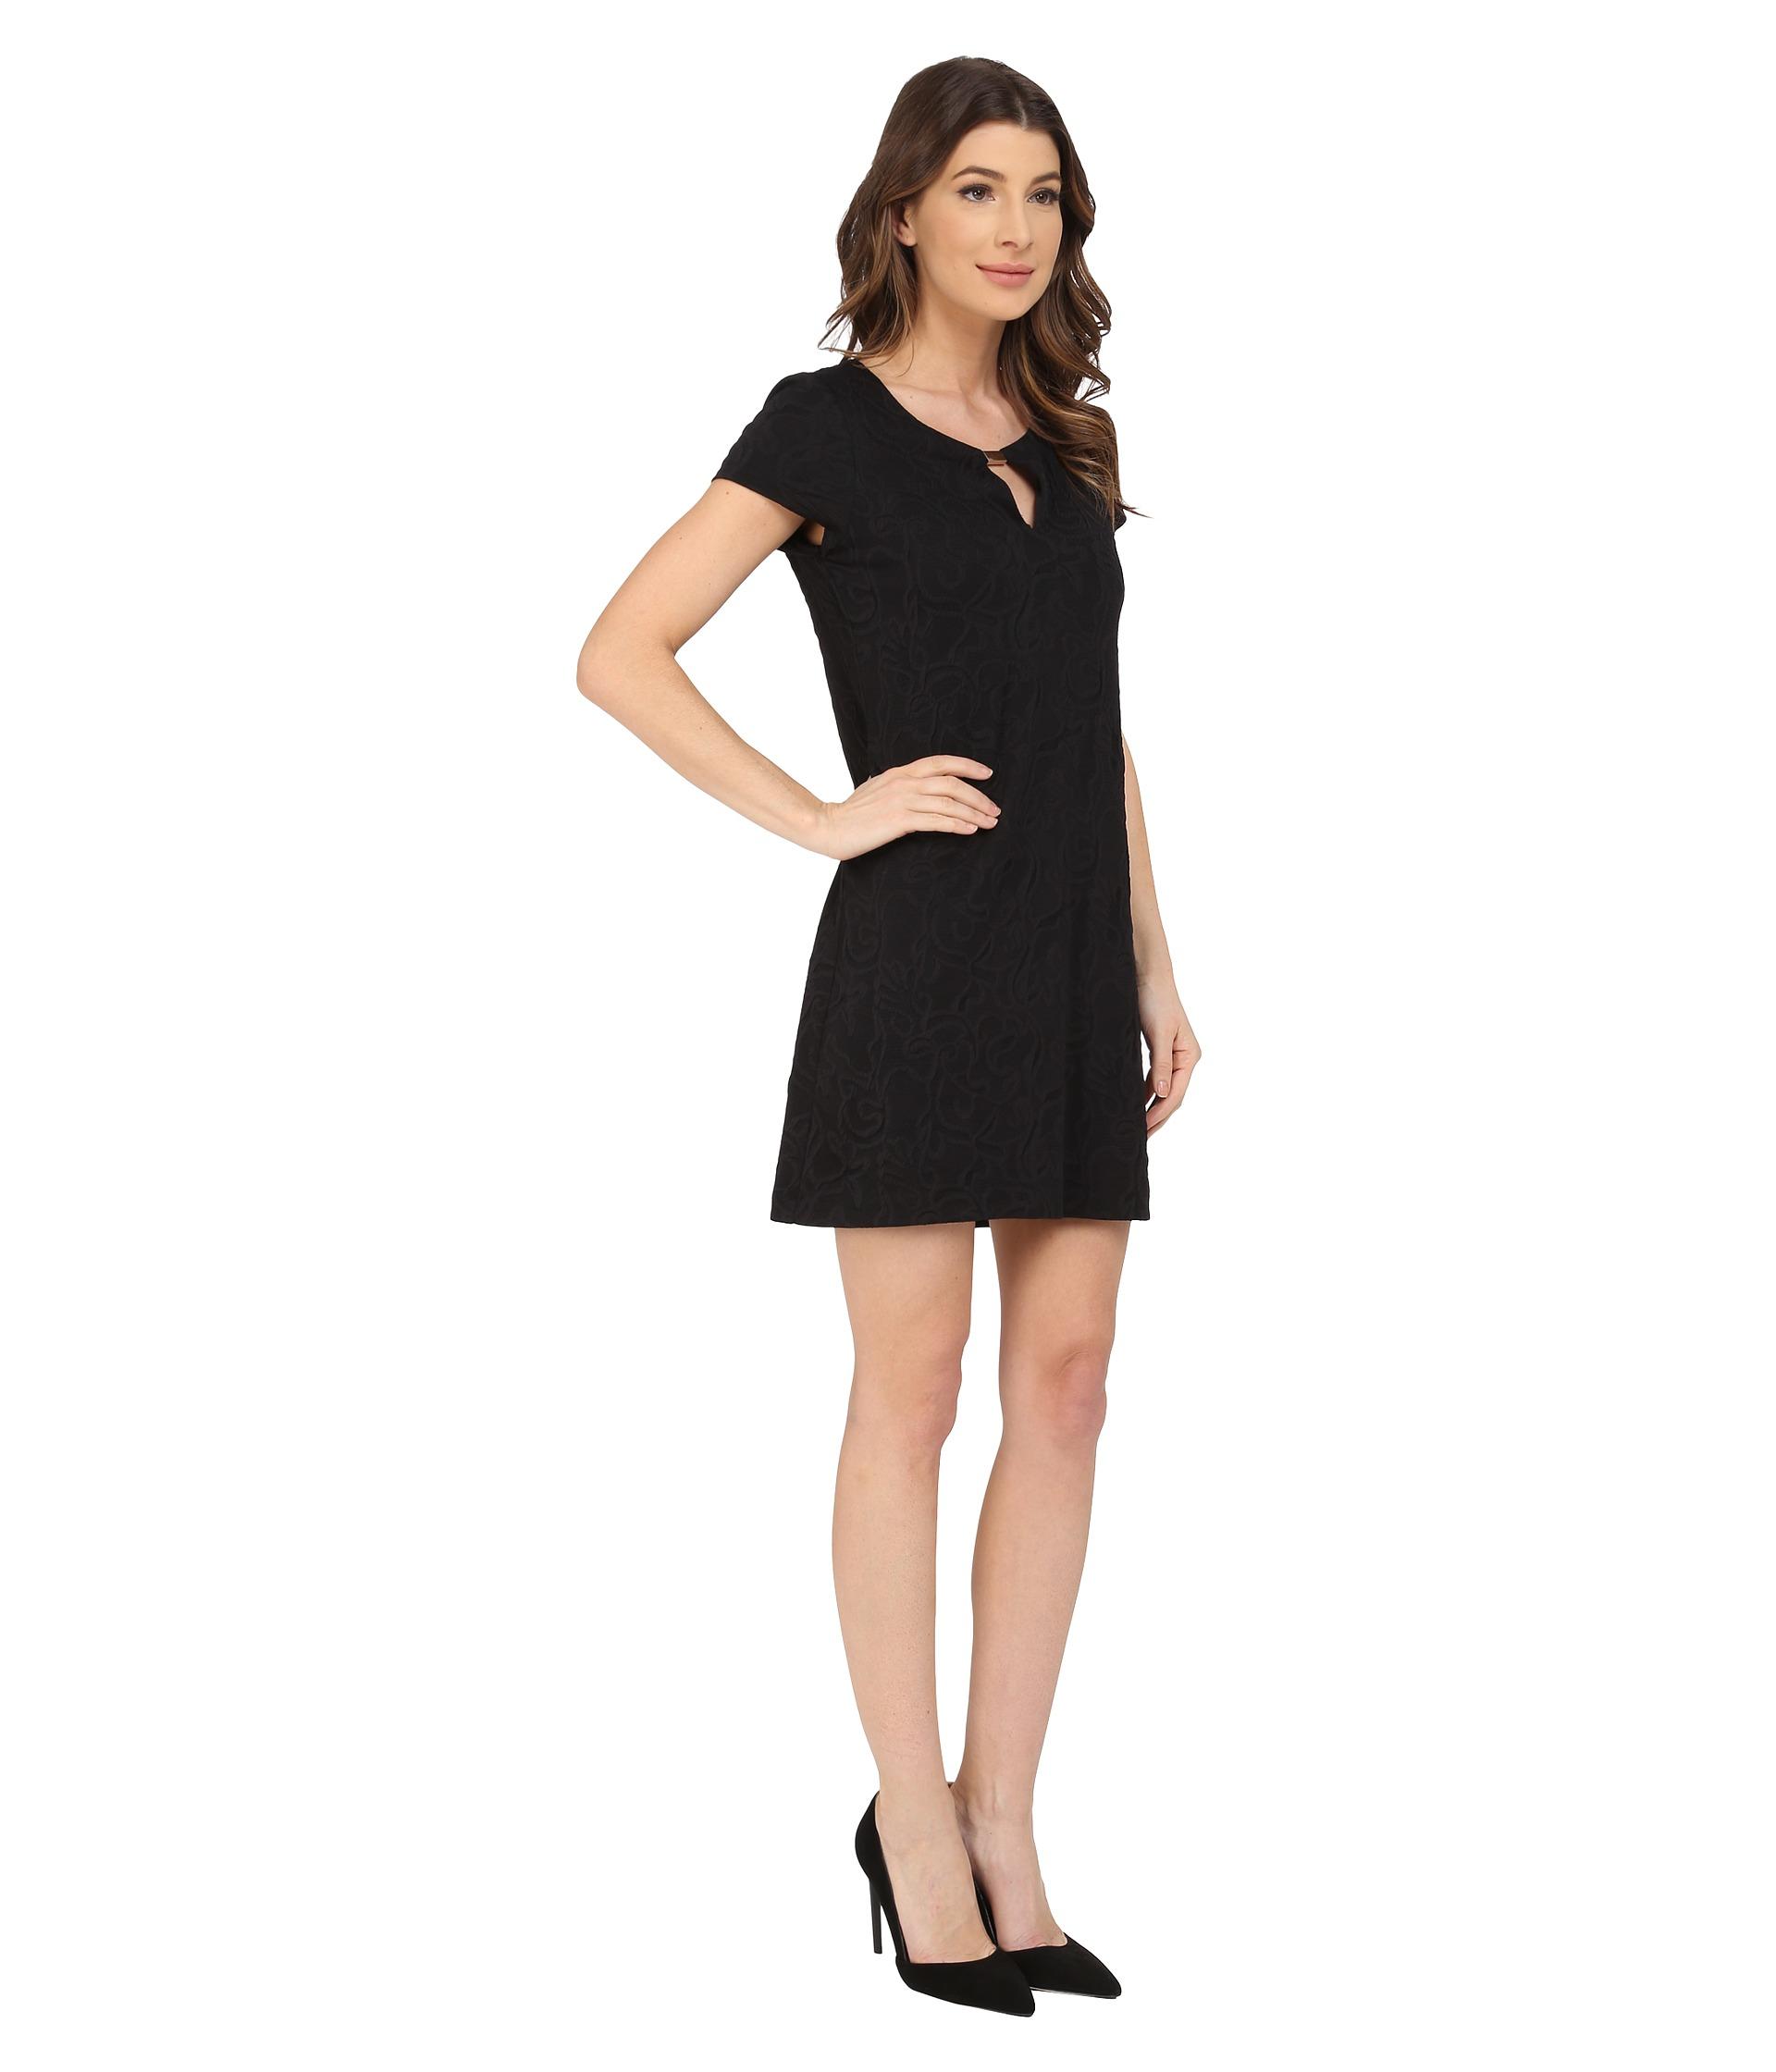 2d6c2fedb6 Black Short Sleeve Shift Dress - Data Dynamic AG